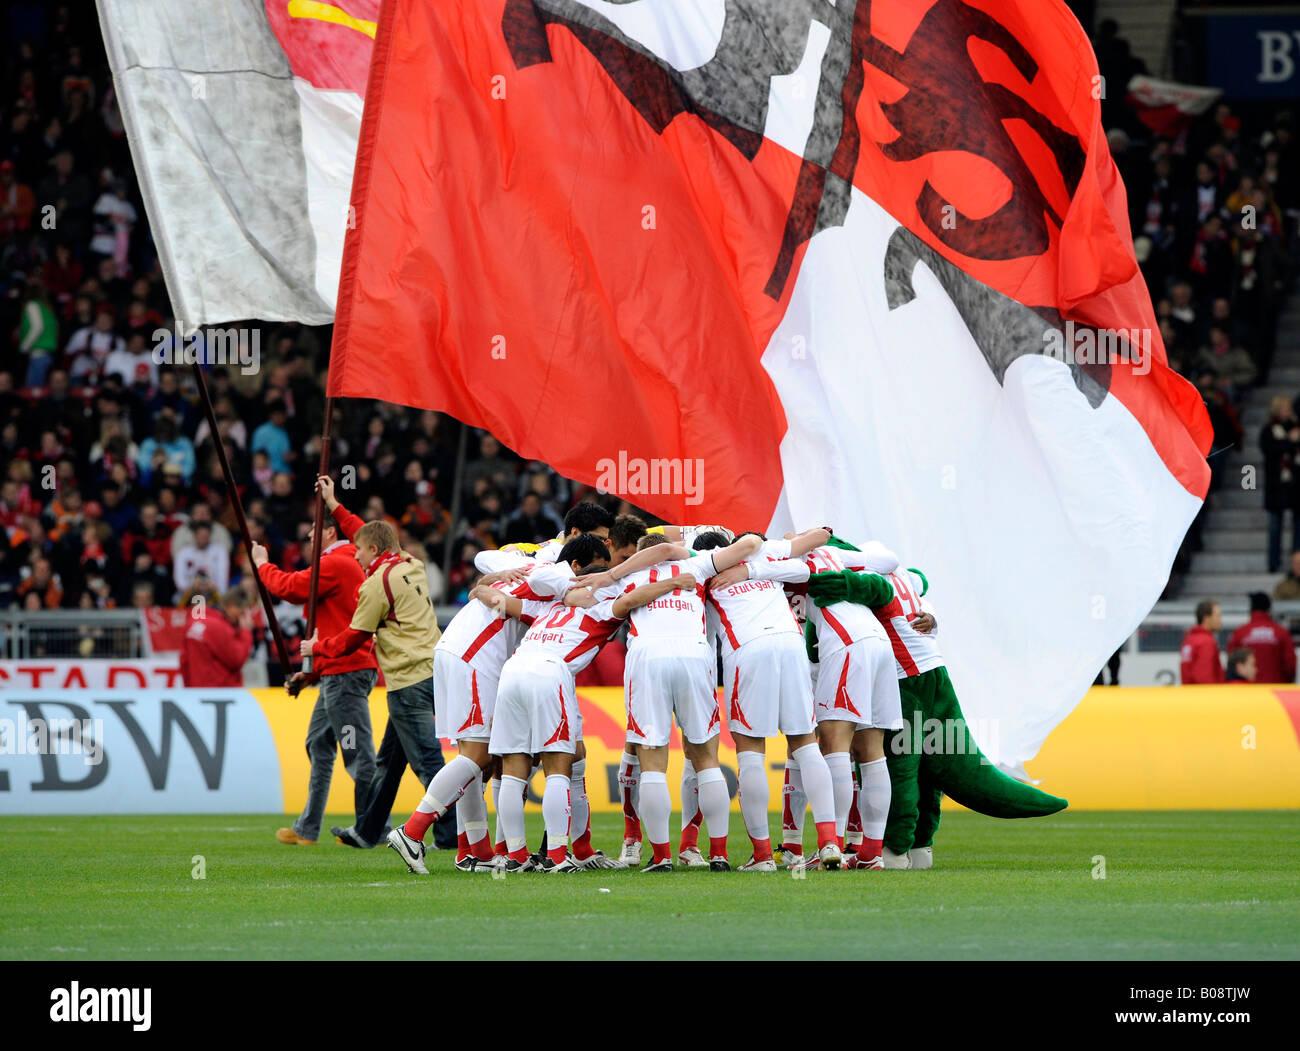 VfB Stuttgart football team swearing itself into the match - Stock Image